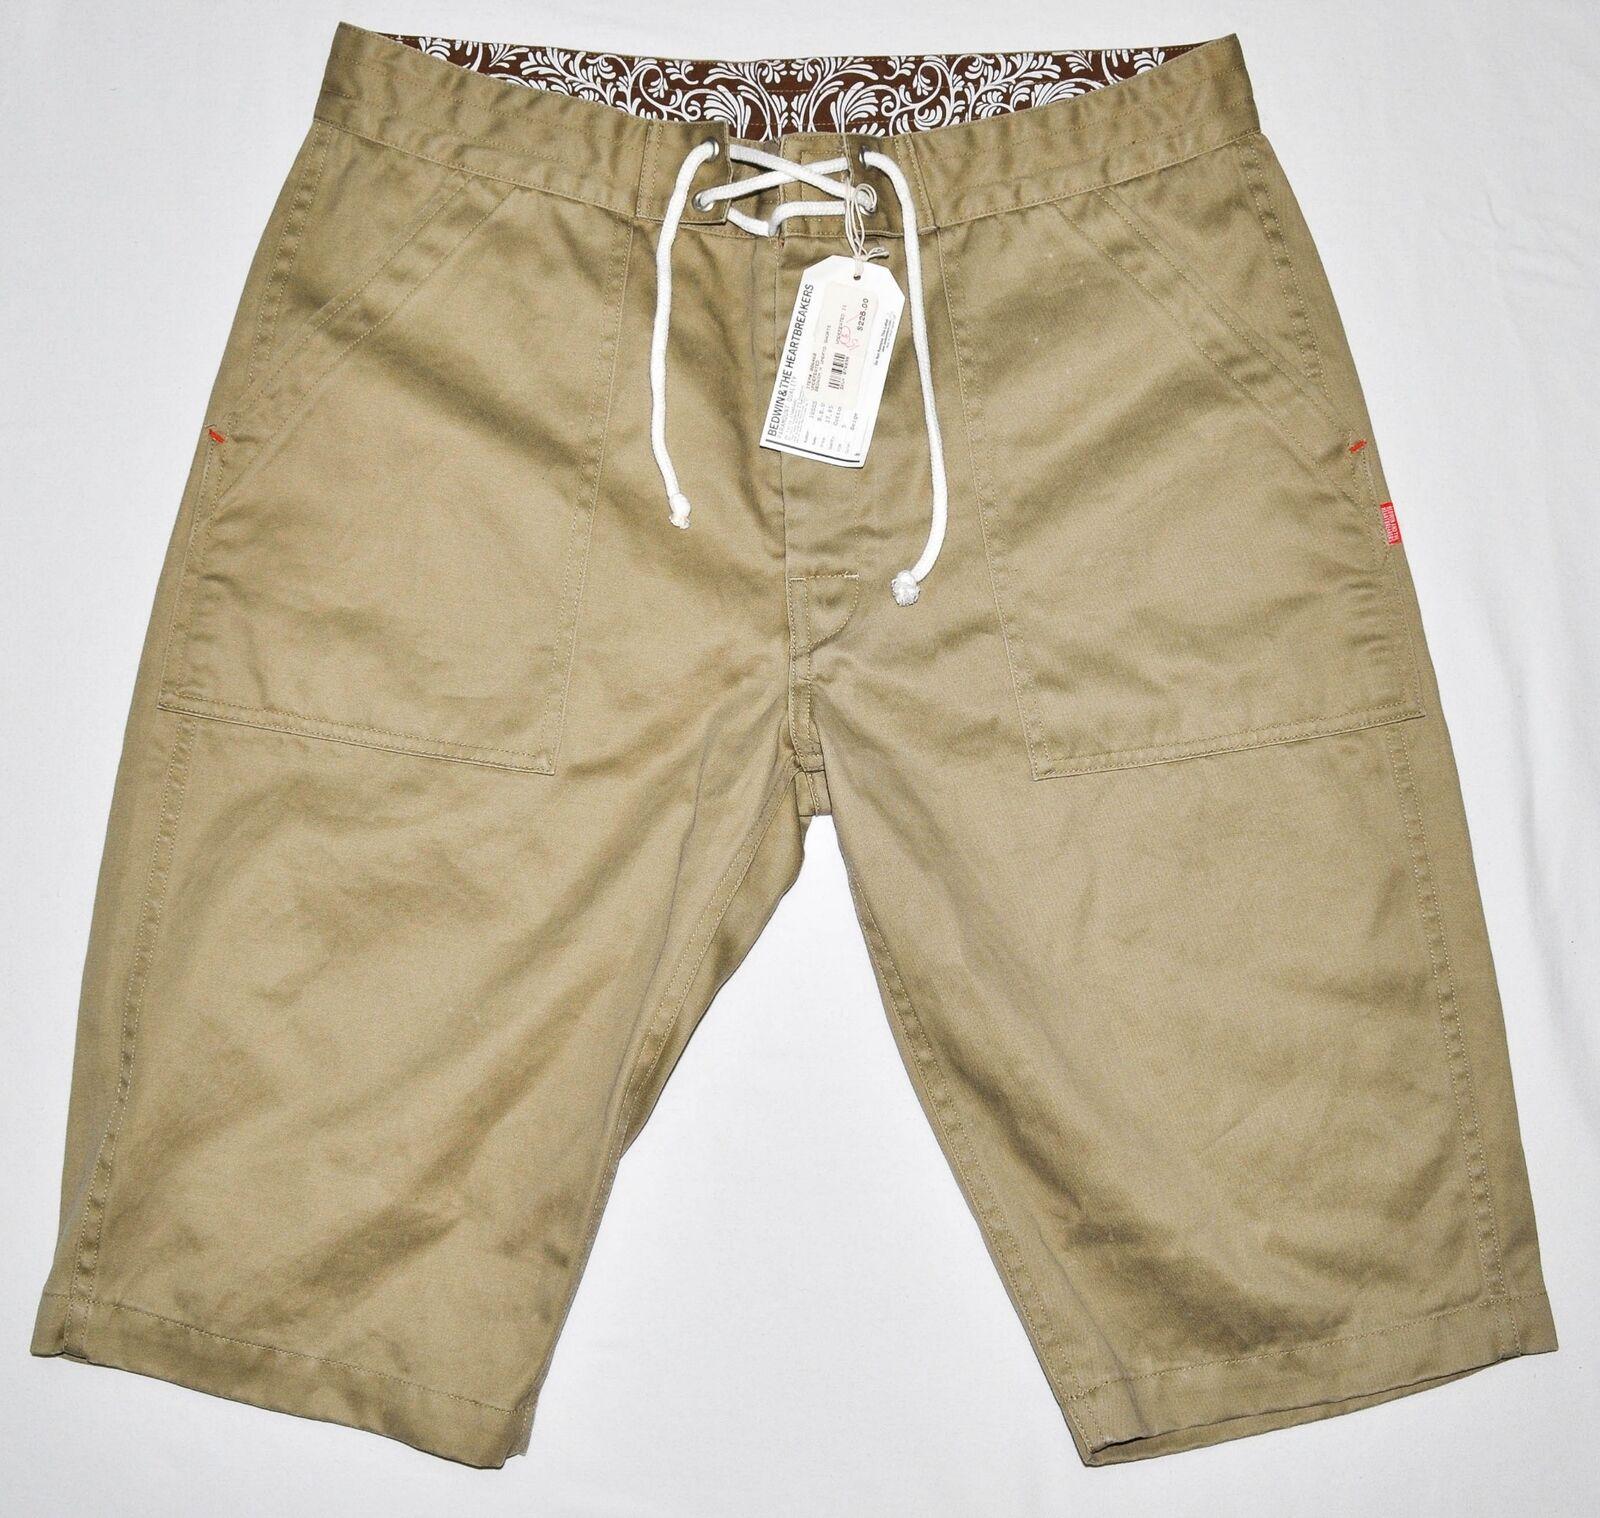 Men's UNDEFEATED x BEDWIN Khaki Shorts size 5 36